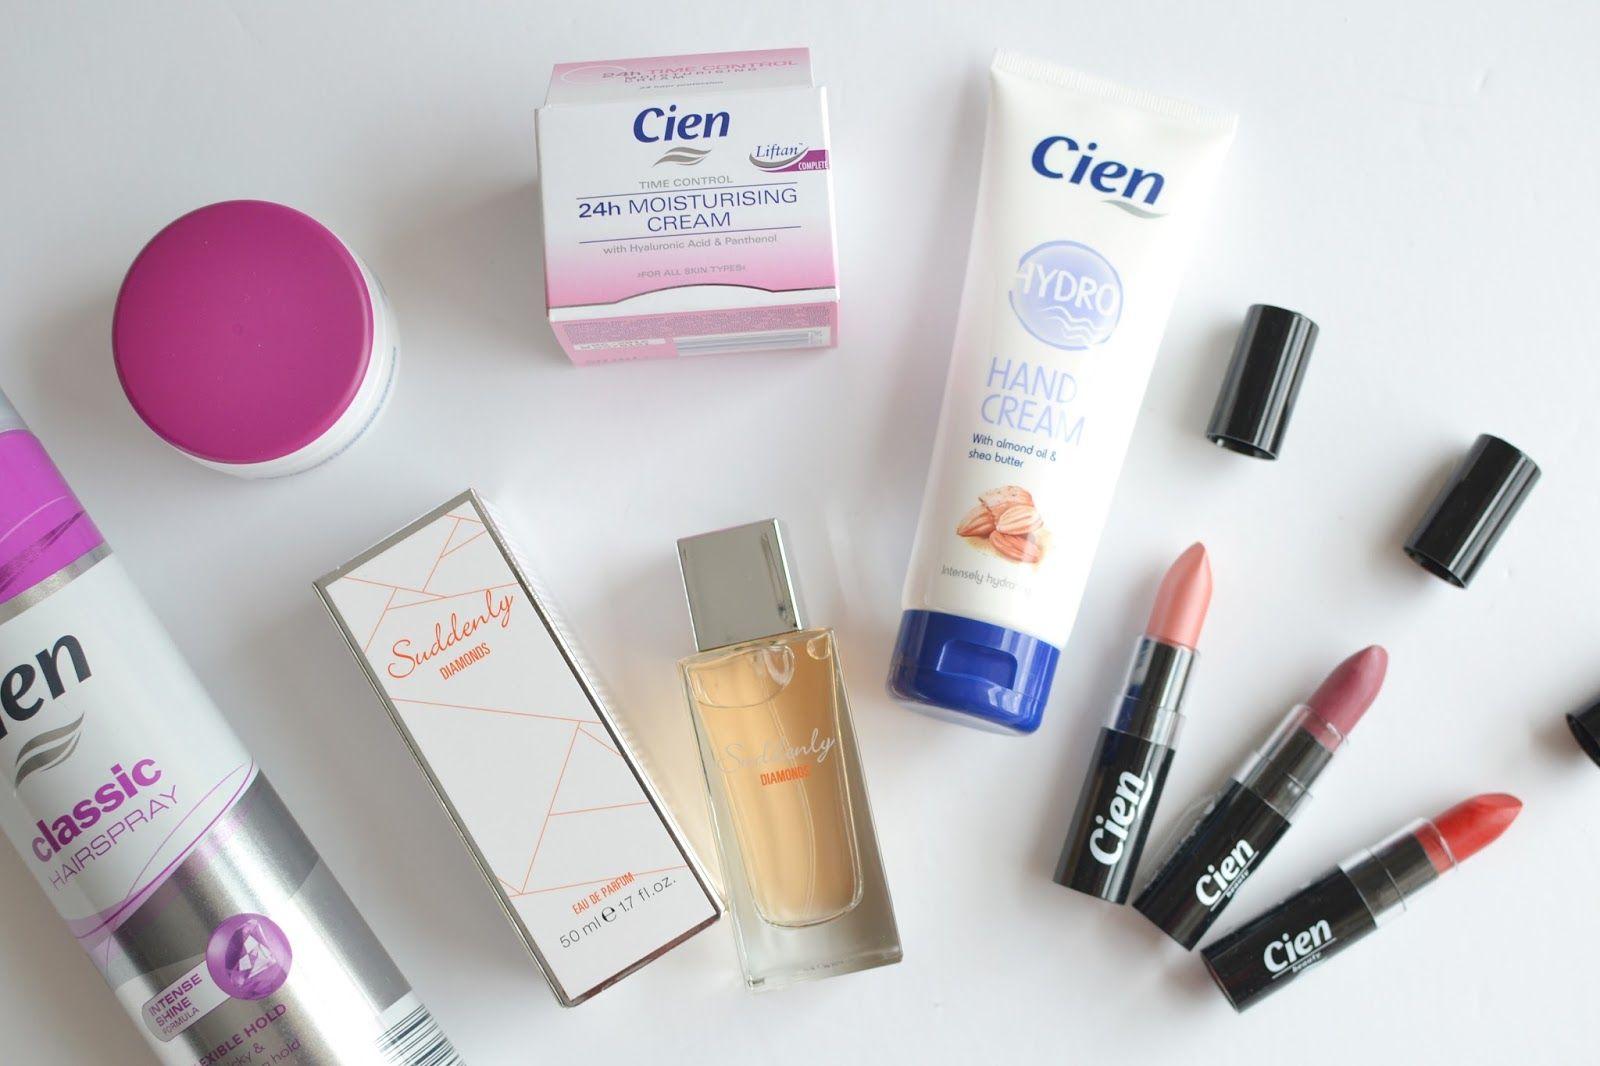 5 Best Lidl Beauty Products Beauty Flawless Skin Lidl